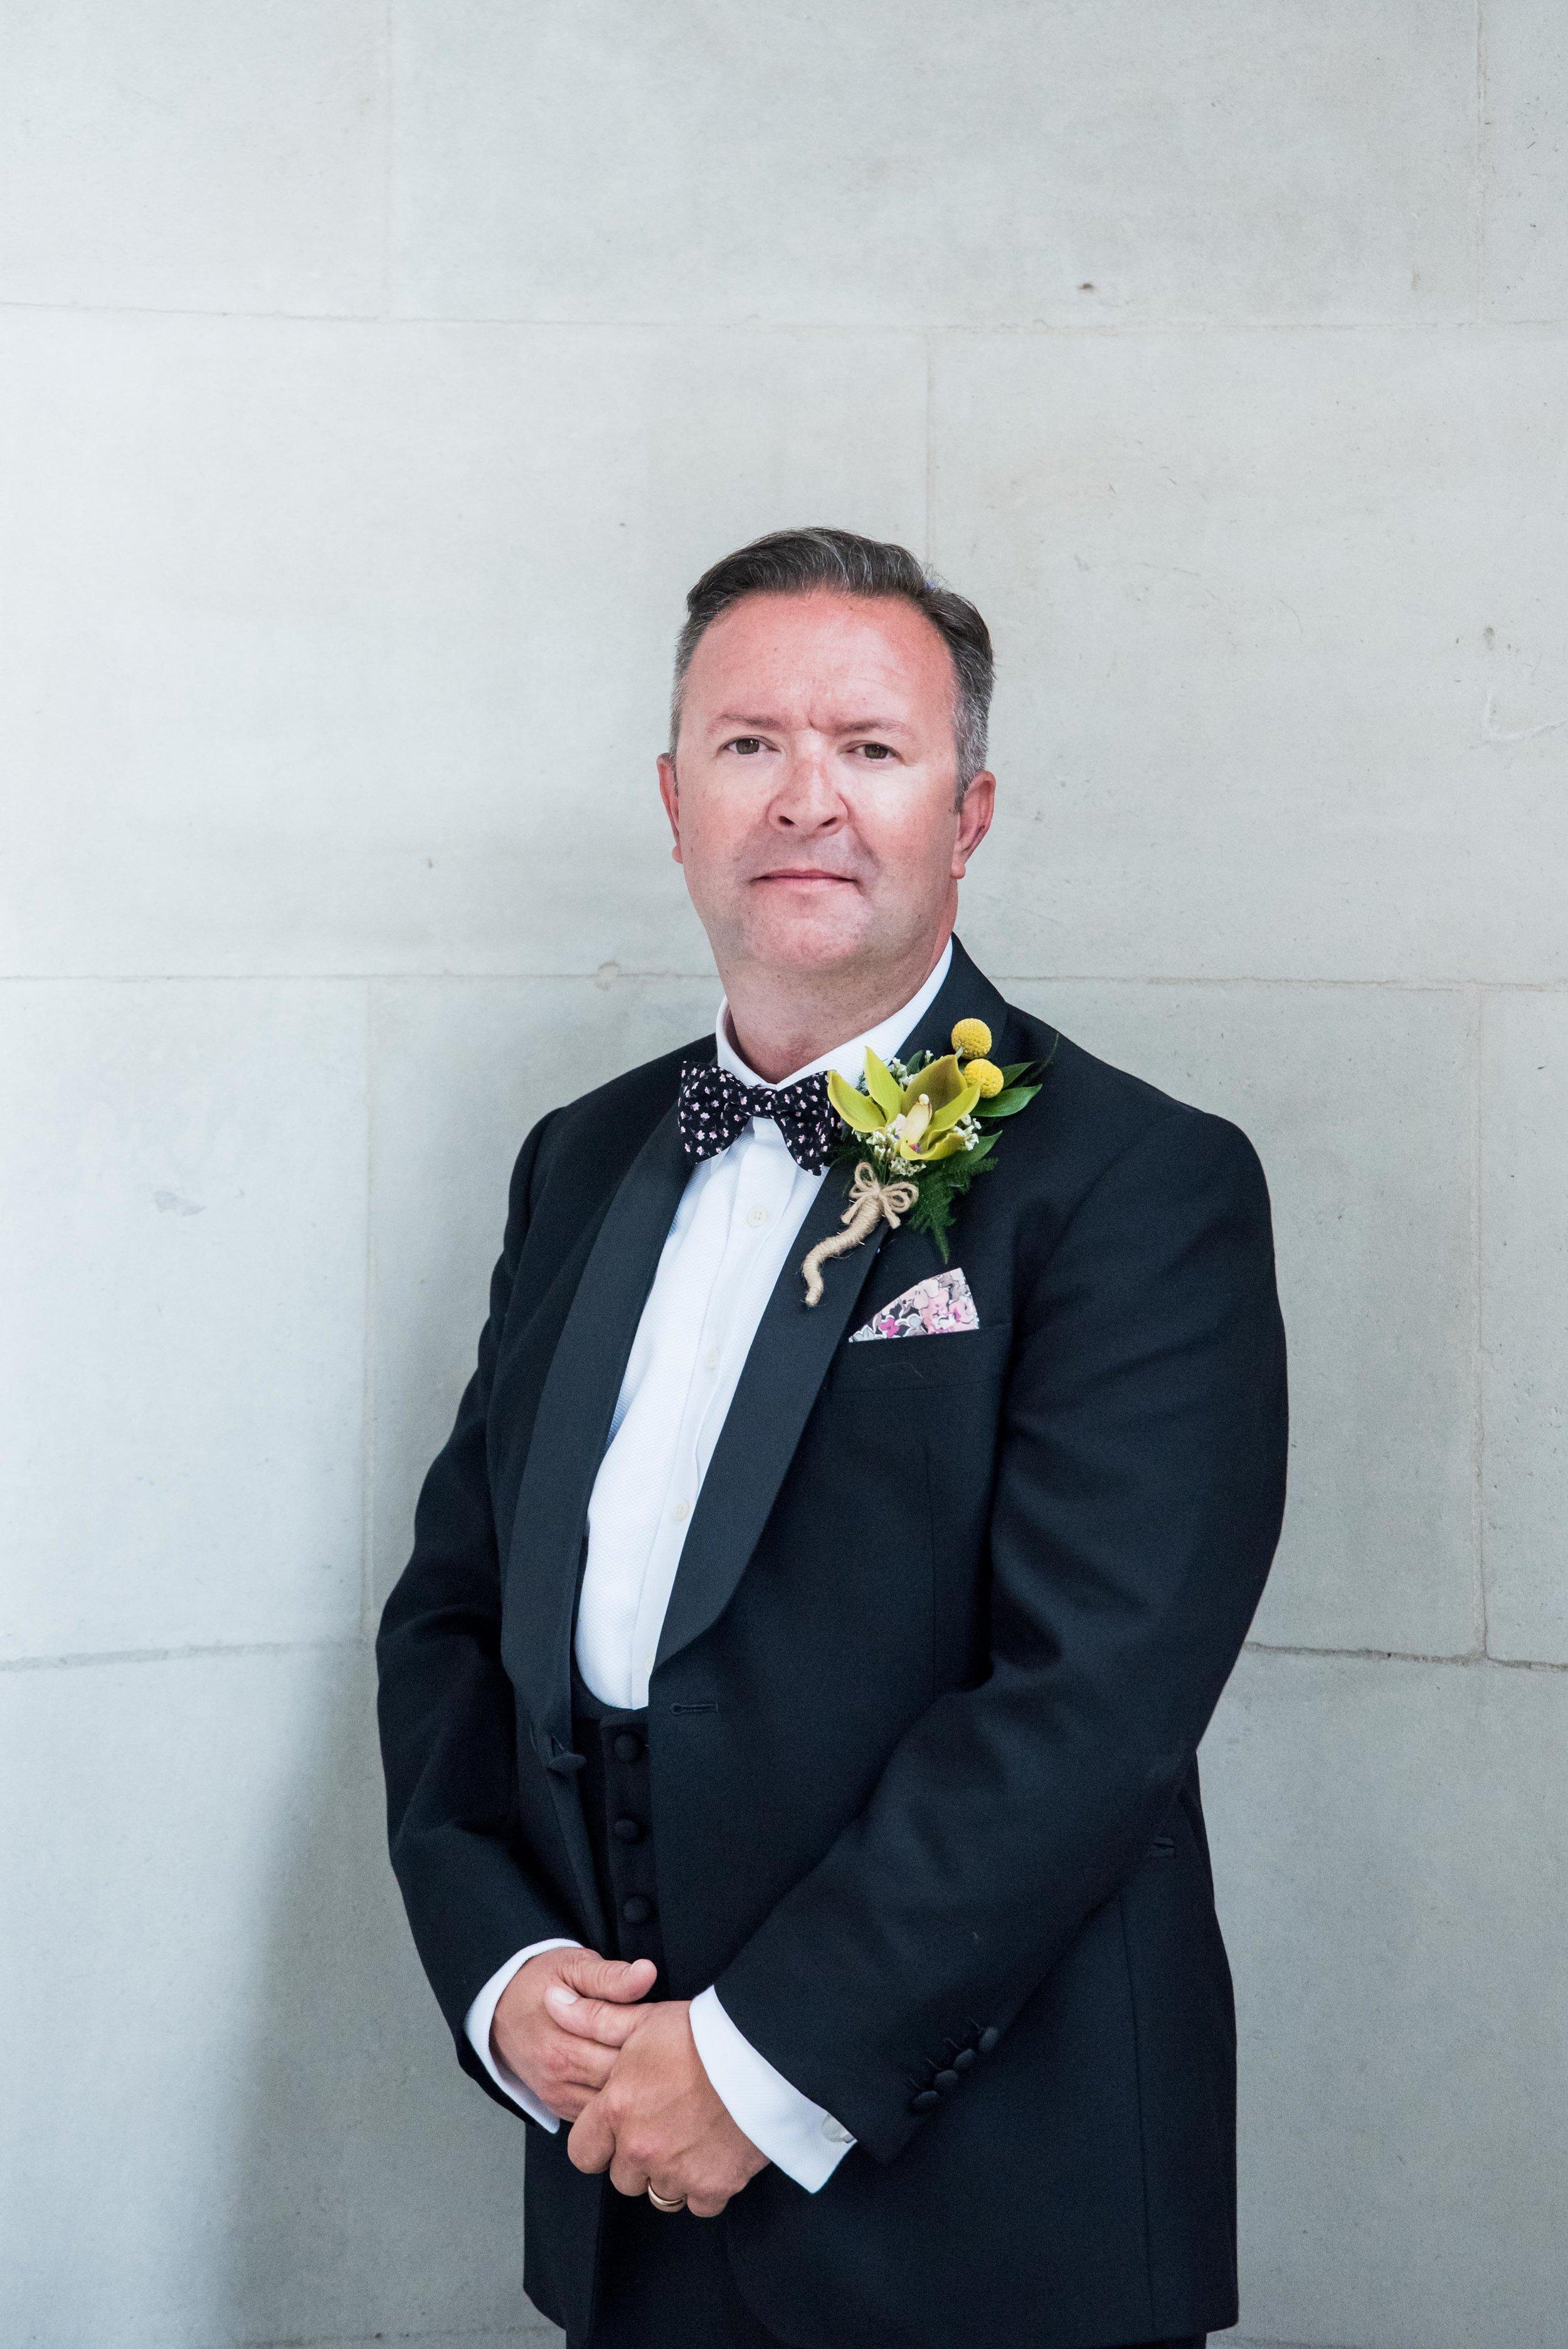 D&M_Marylebone Town Hall Wedding (148 of 239).jpg